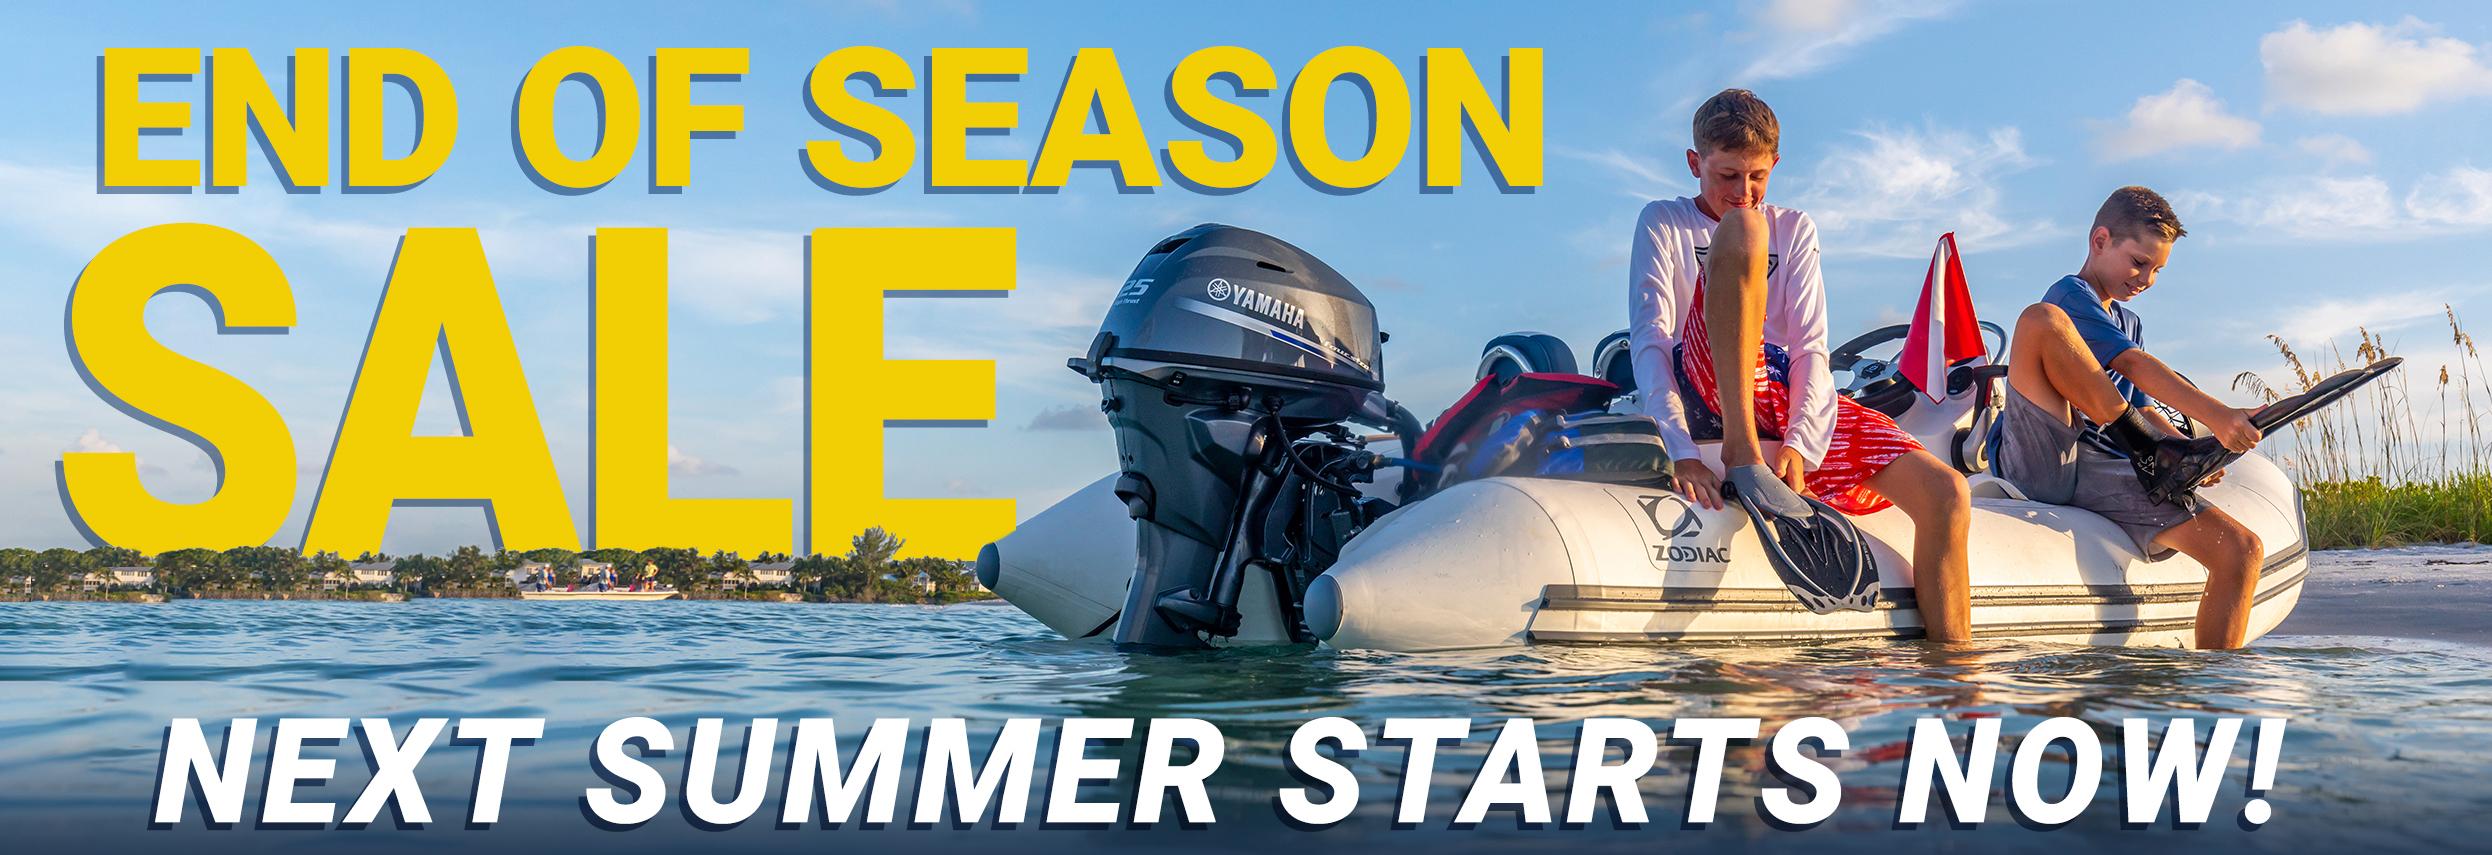 zodiac-end-of-season-sale-banner.jpg